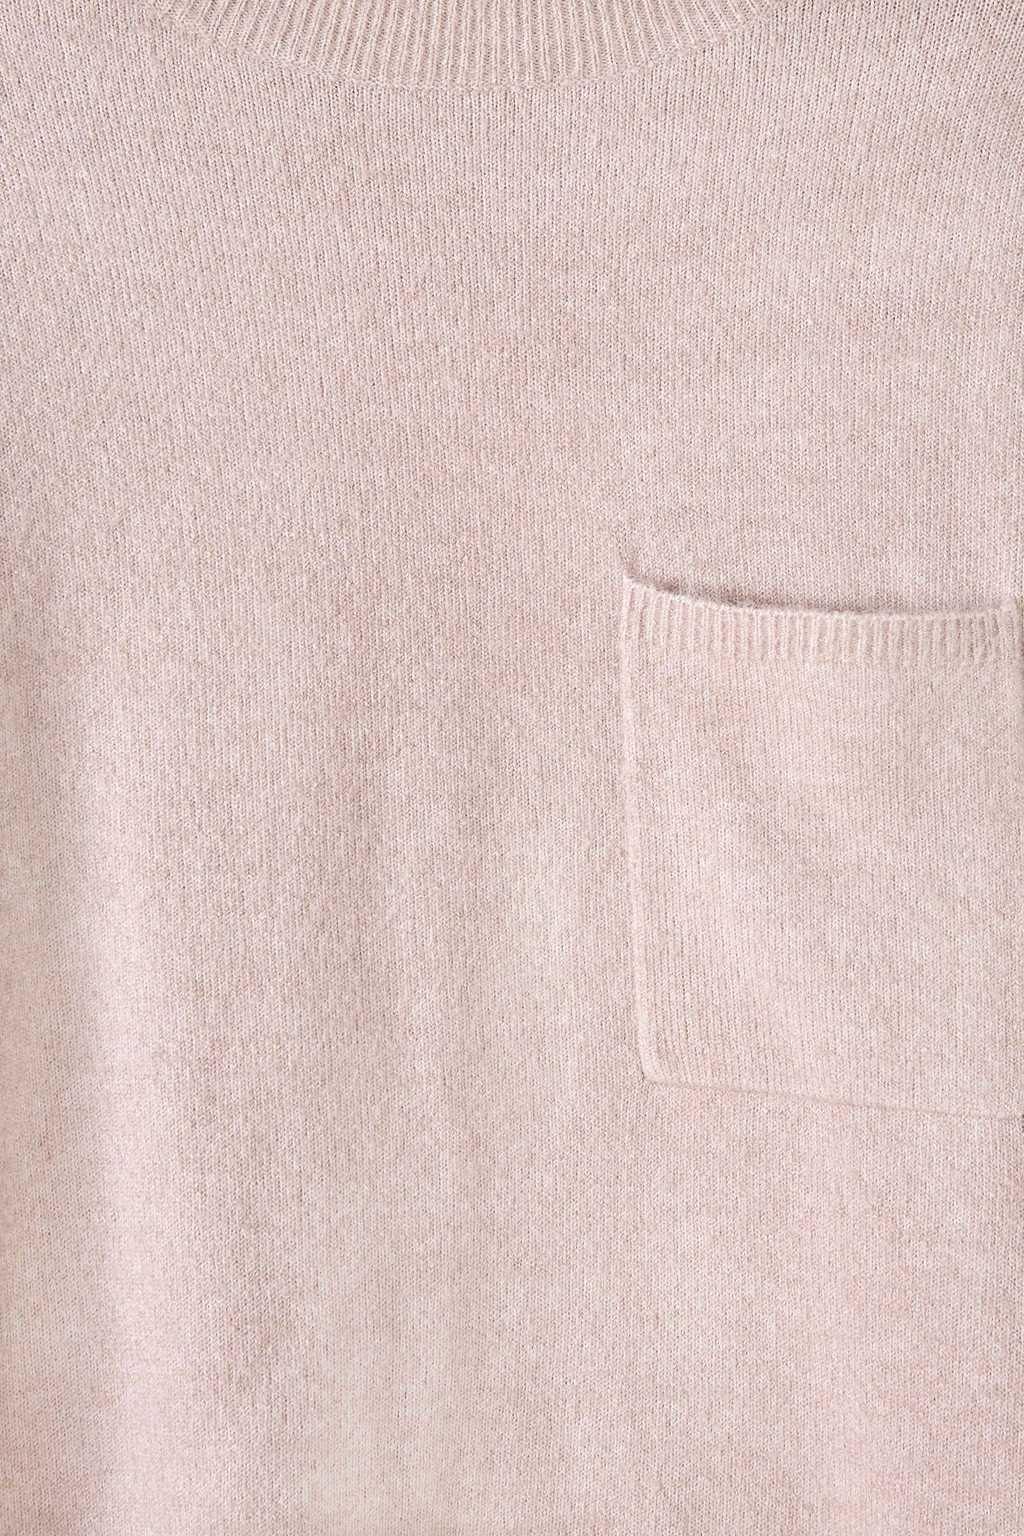 Sweater 2406 Oatmeal 11